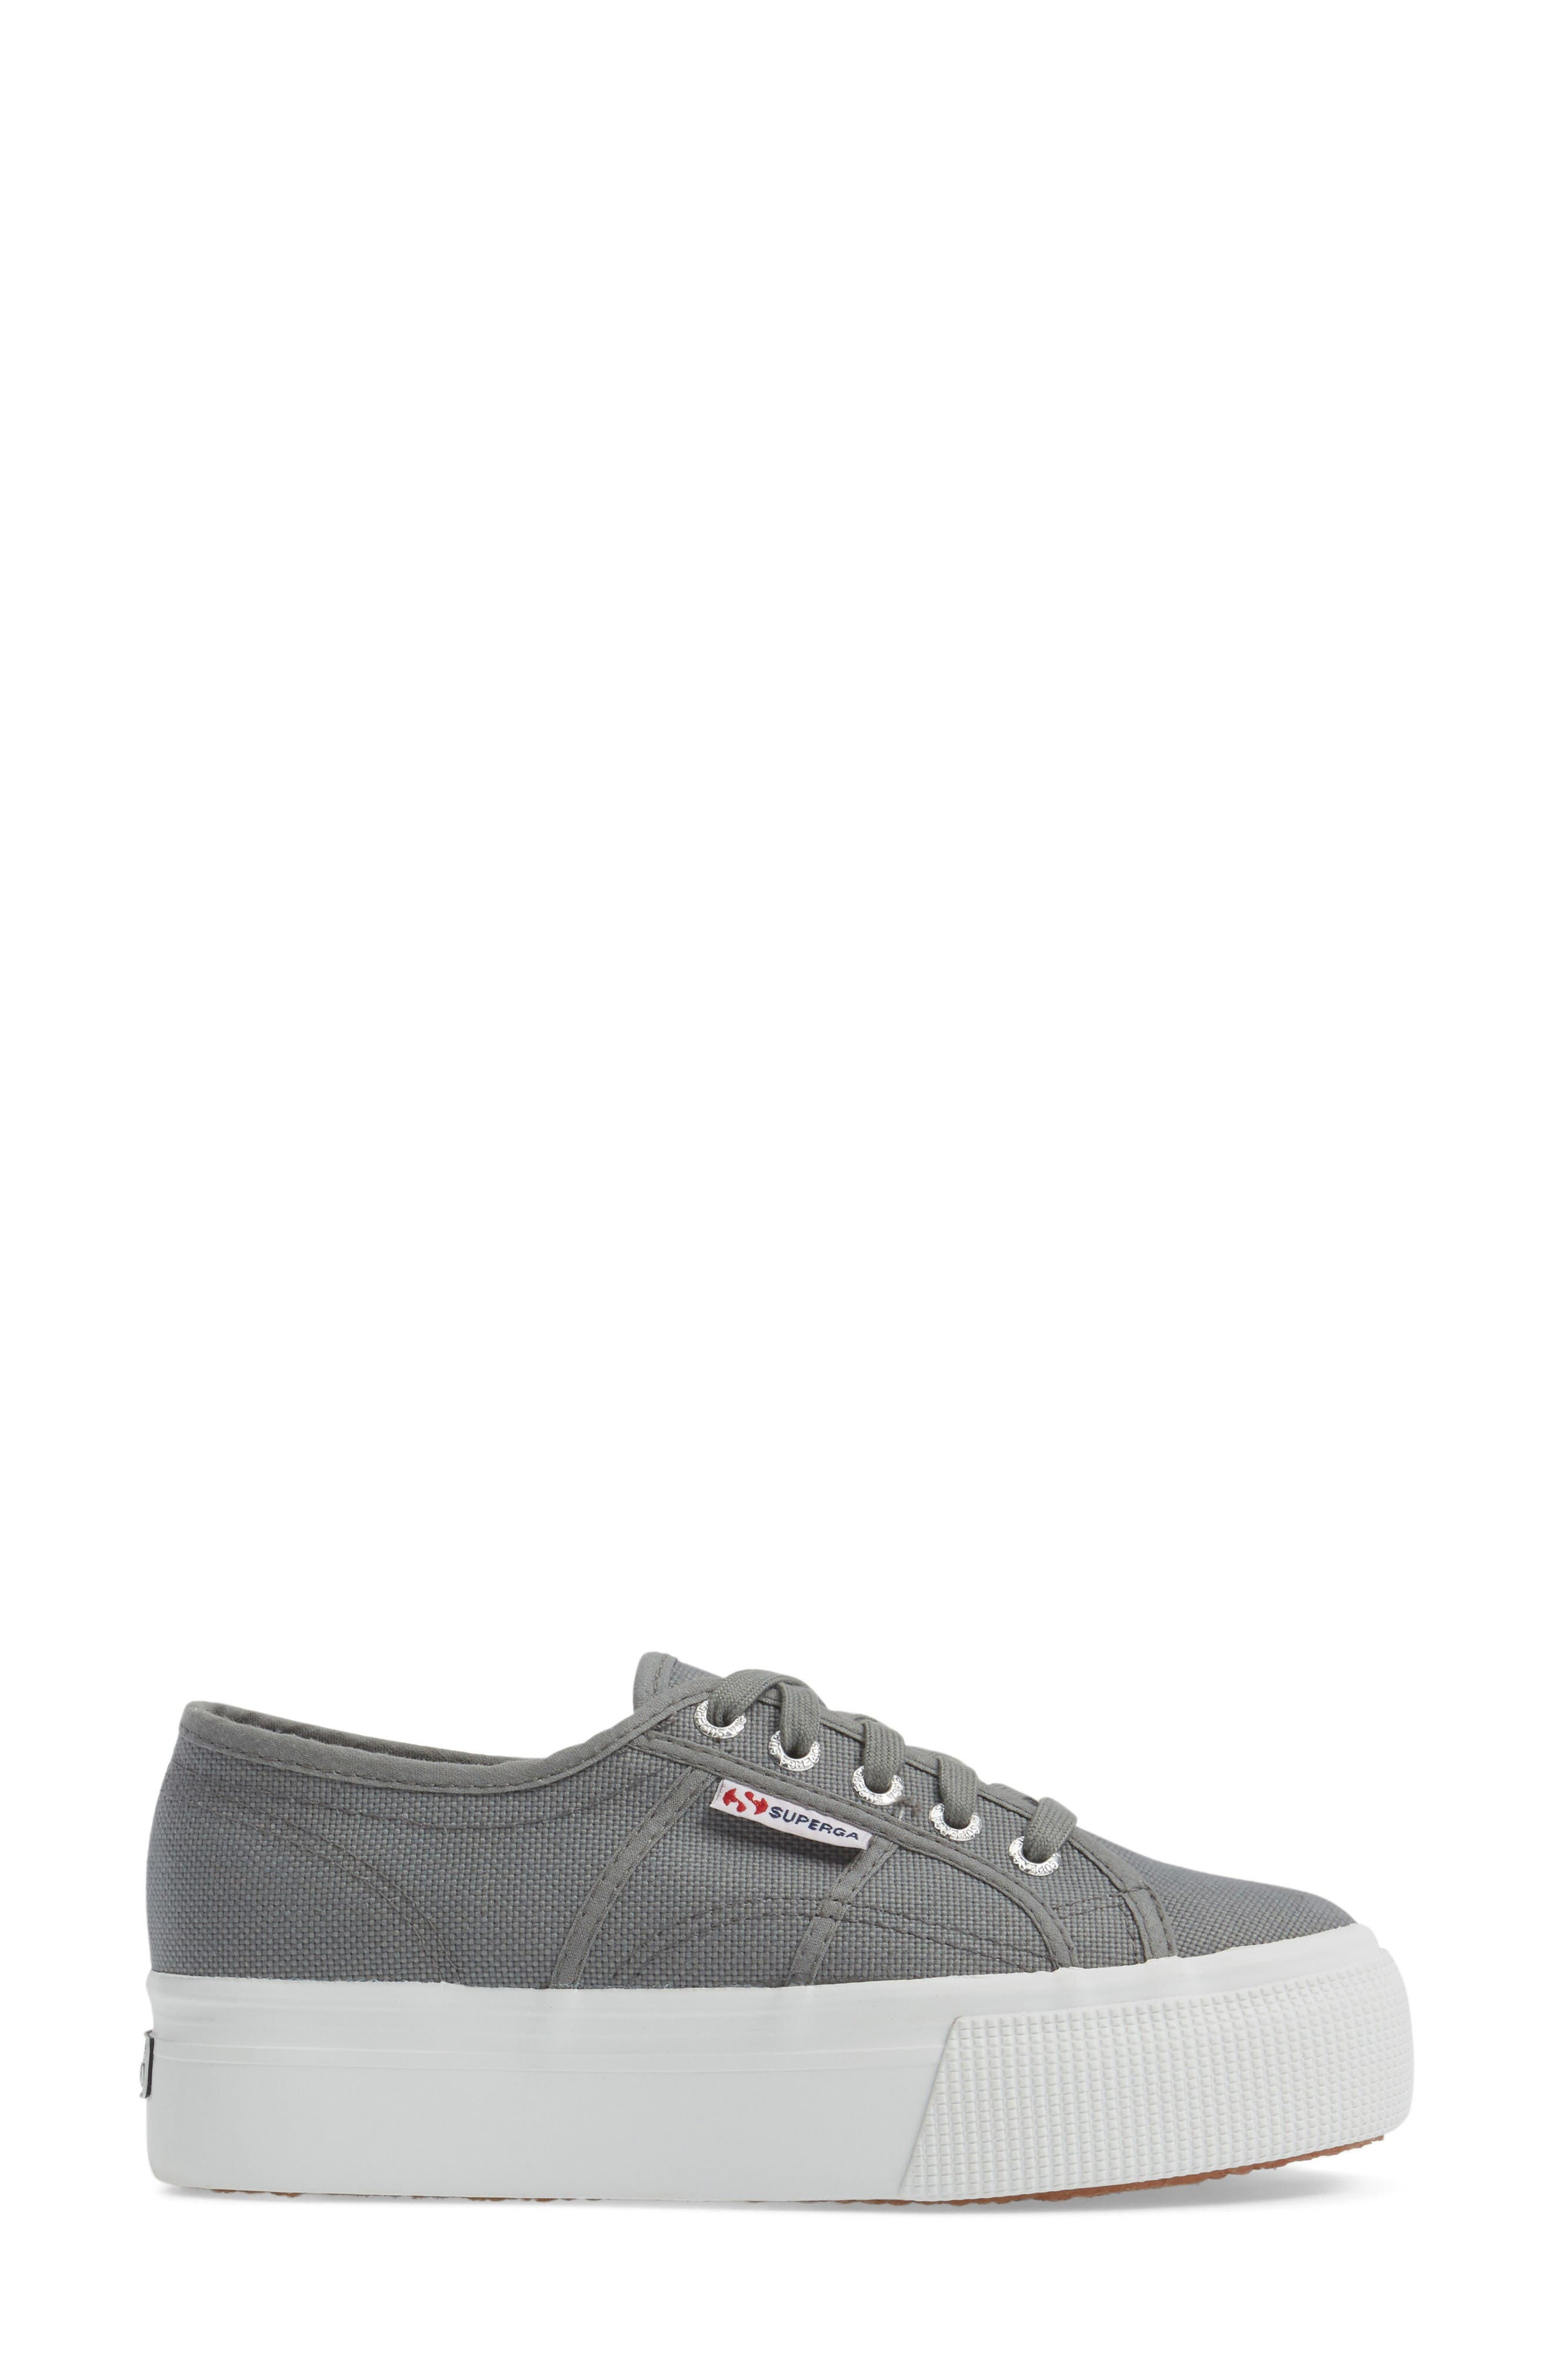 Alternate Image 3  - Superga 'Acot Linea' Sneaker (Women)